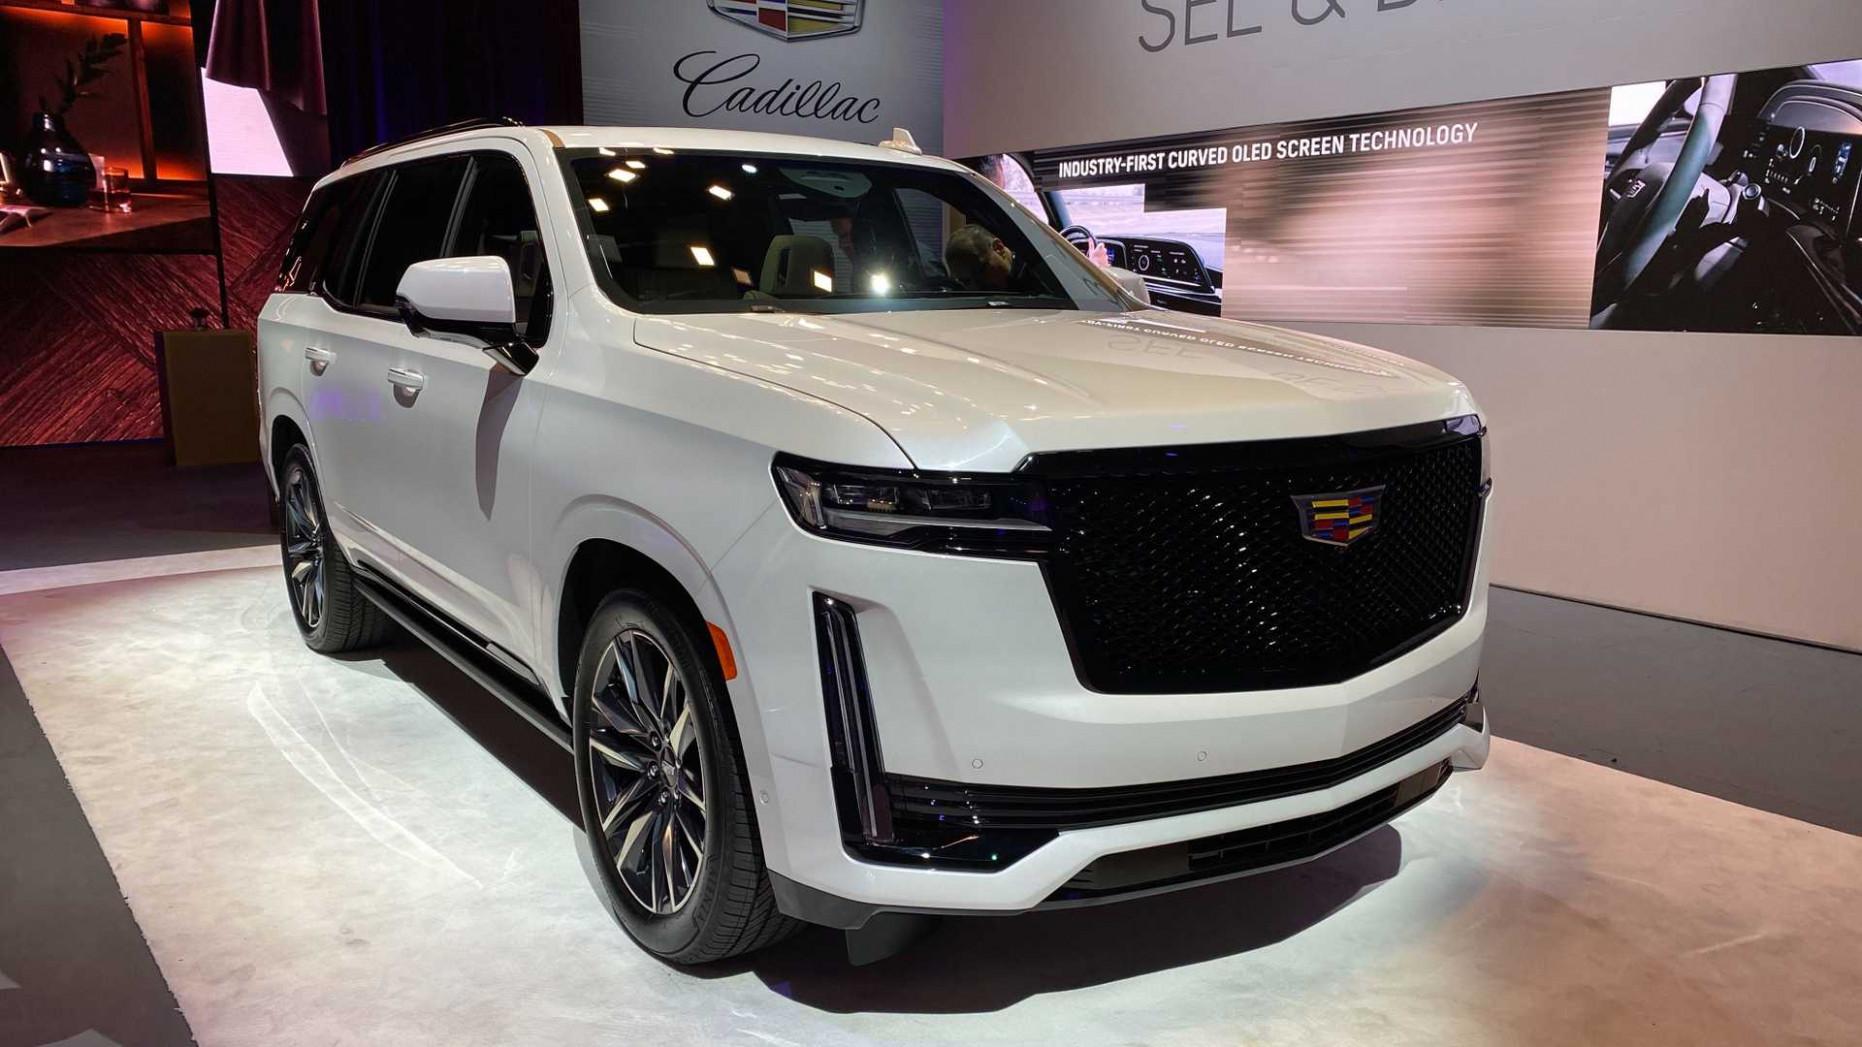 Review Cadillac Escalade 2022 Model